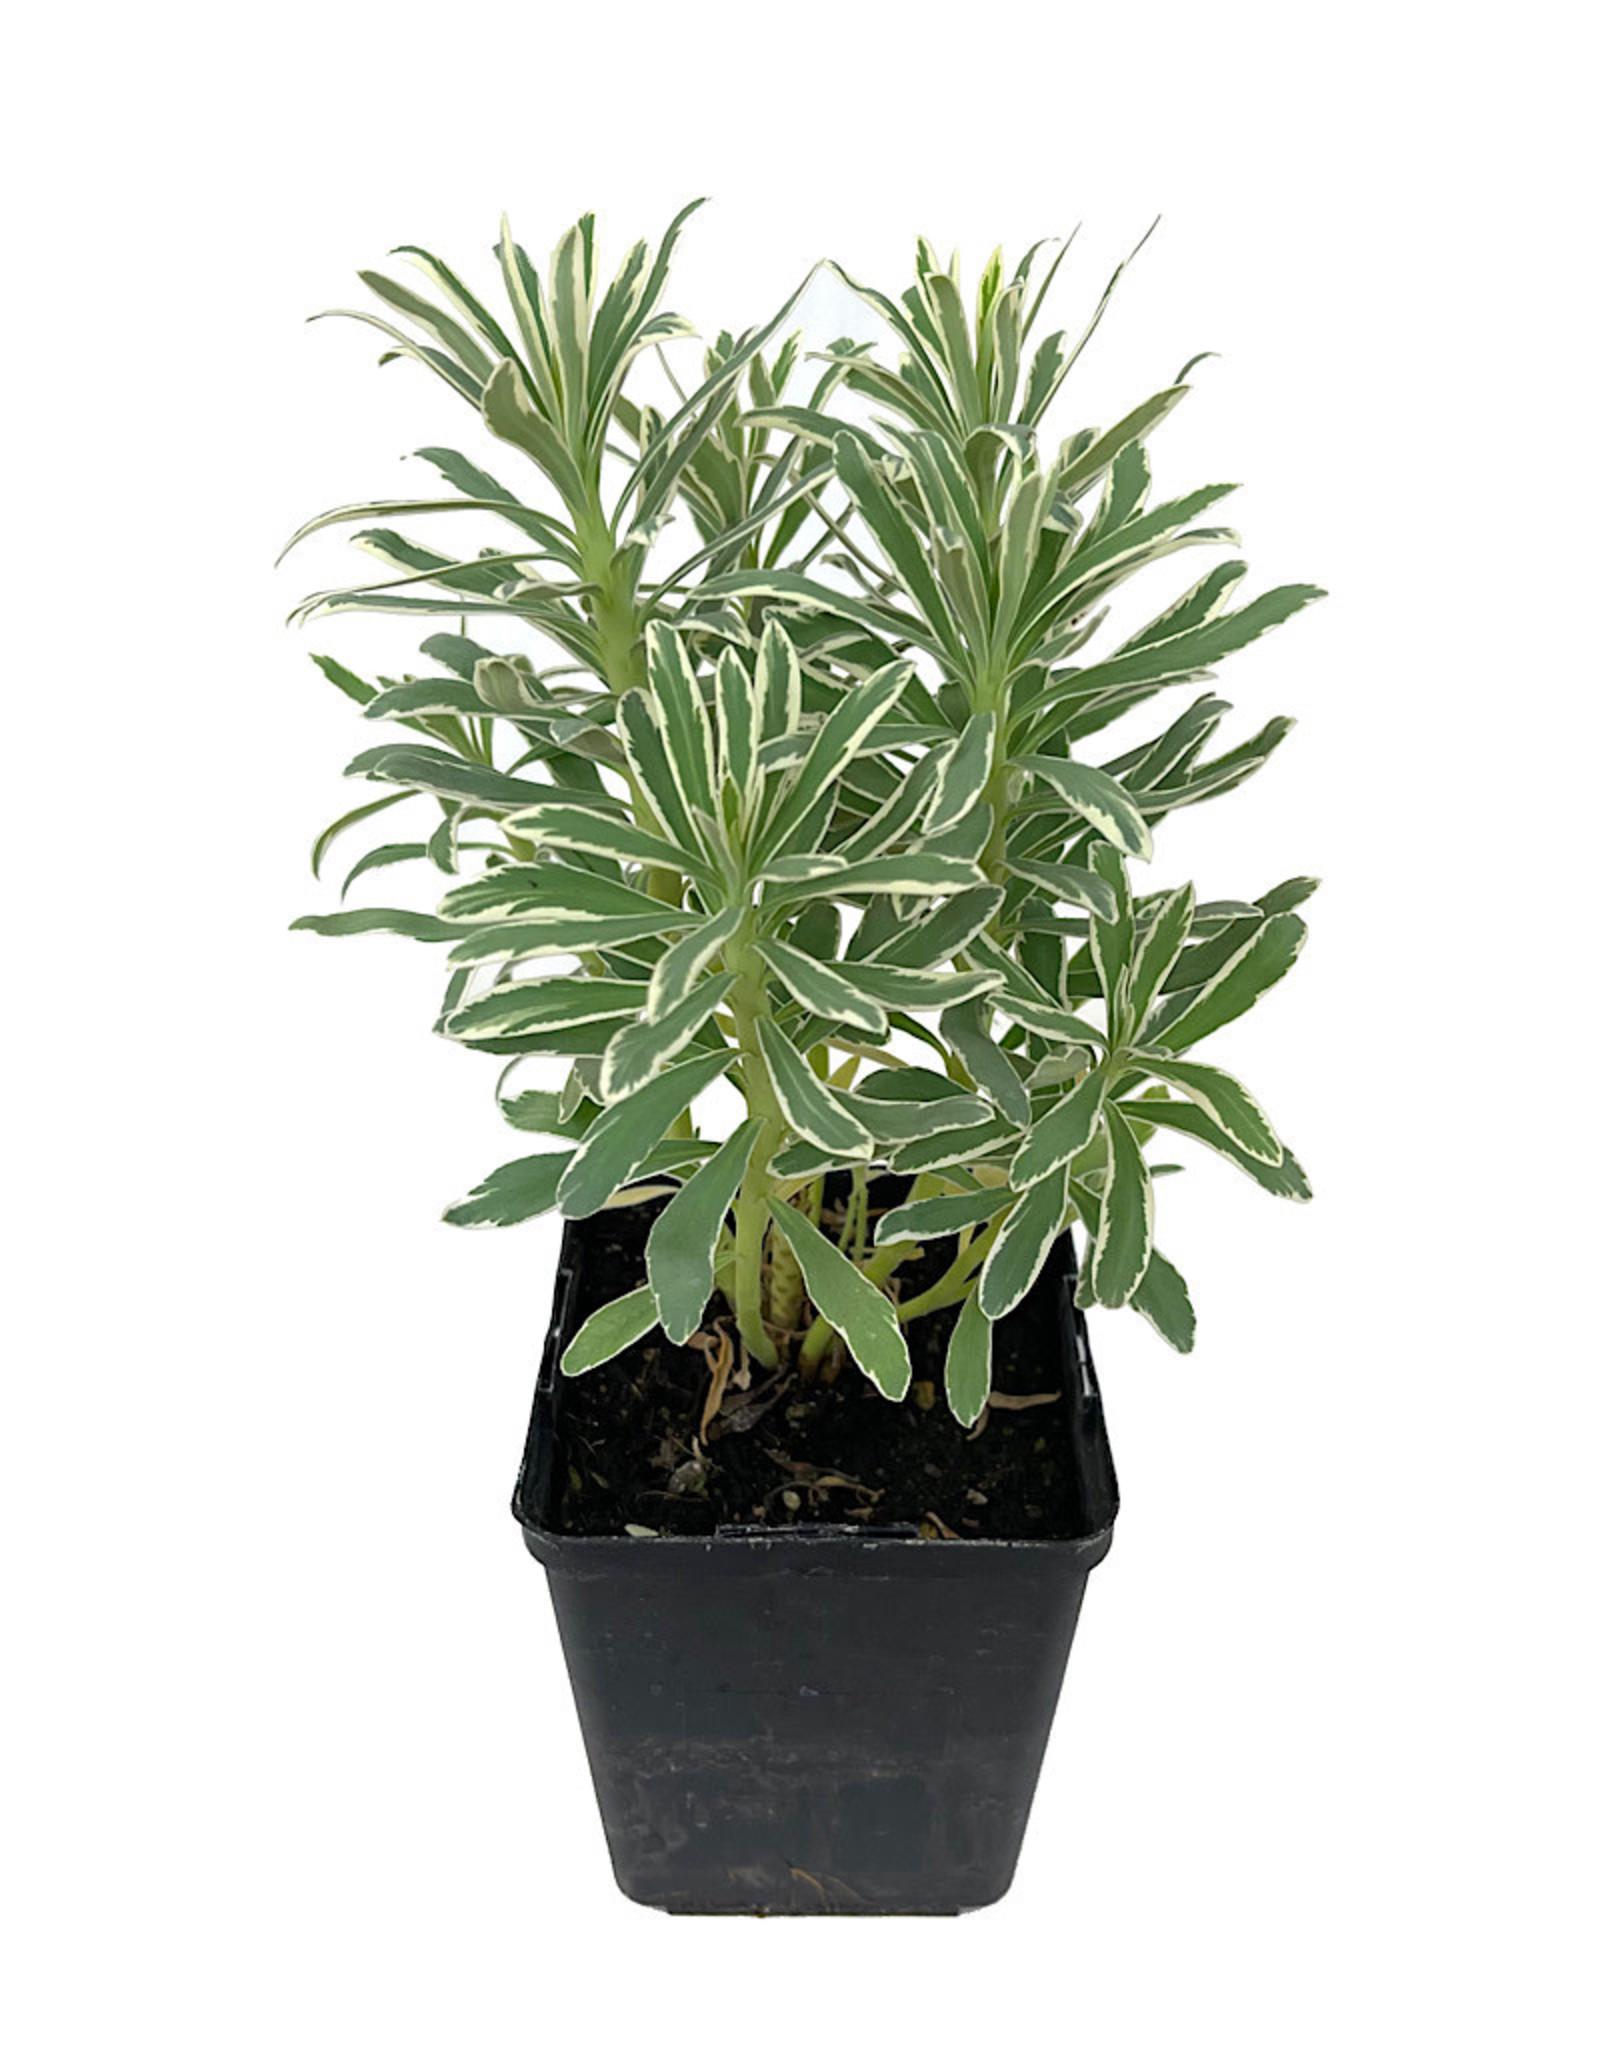 Euphorbia 'Glacier Blue' Quart